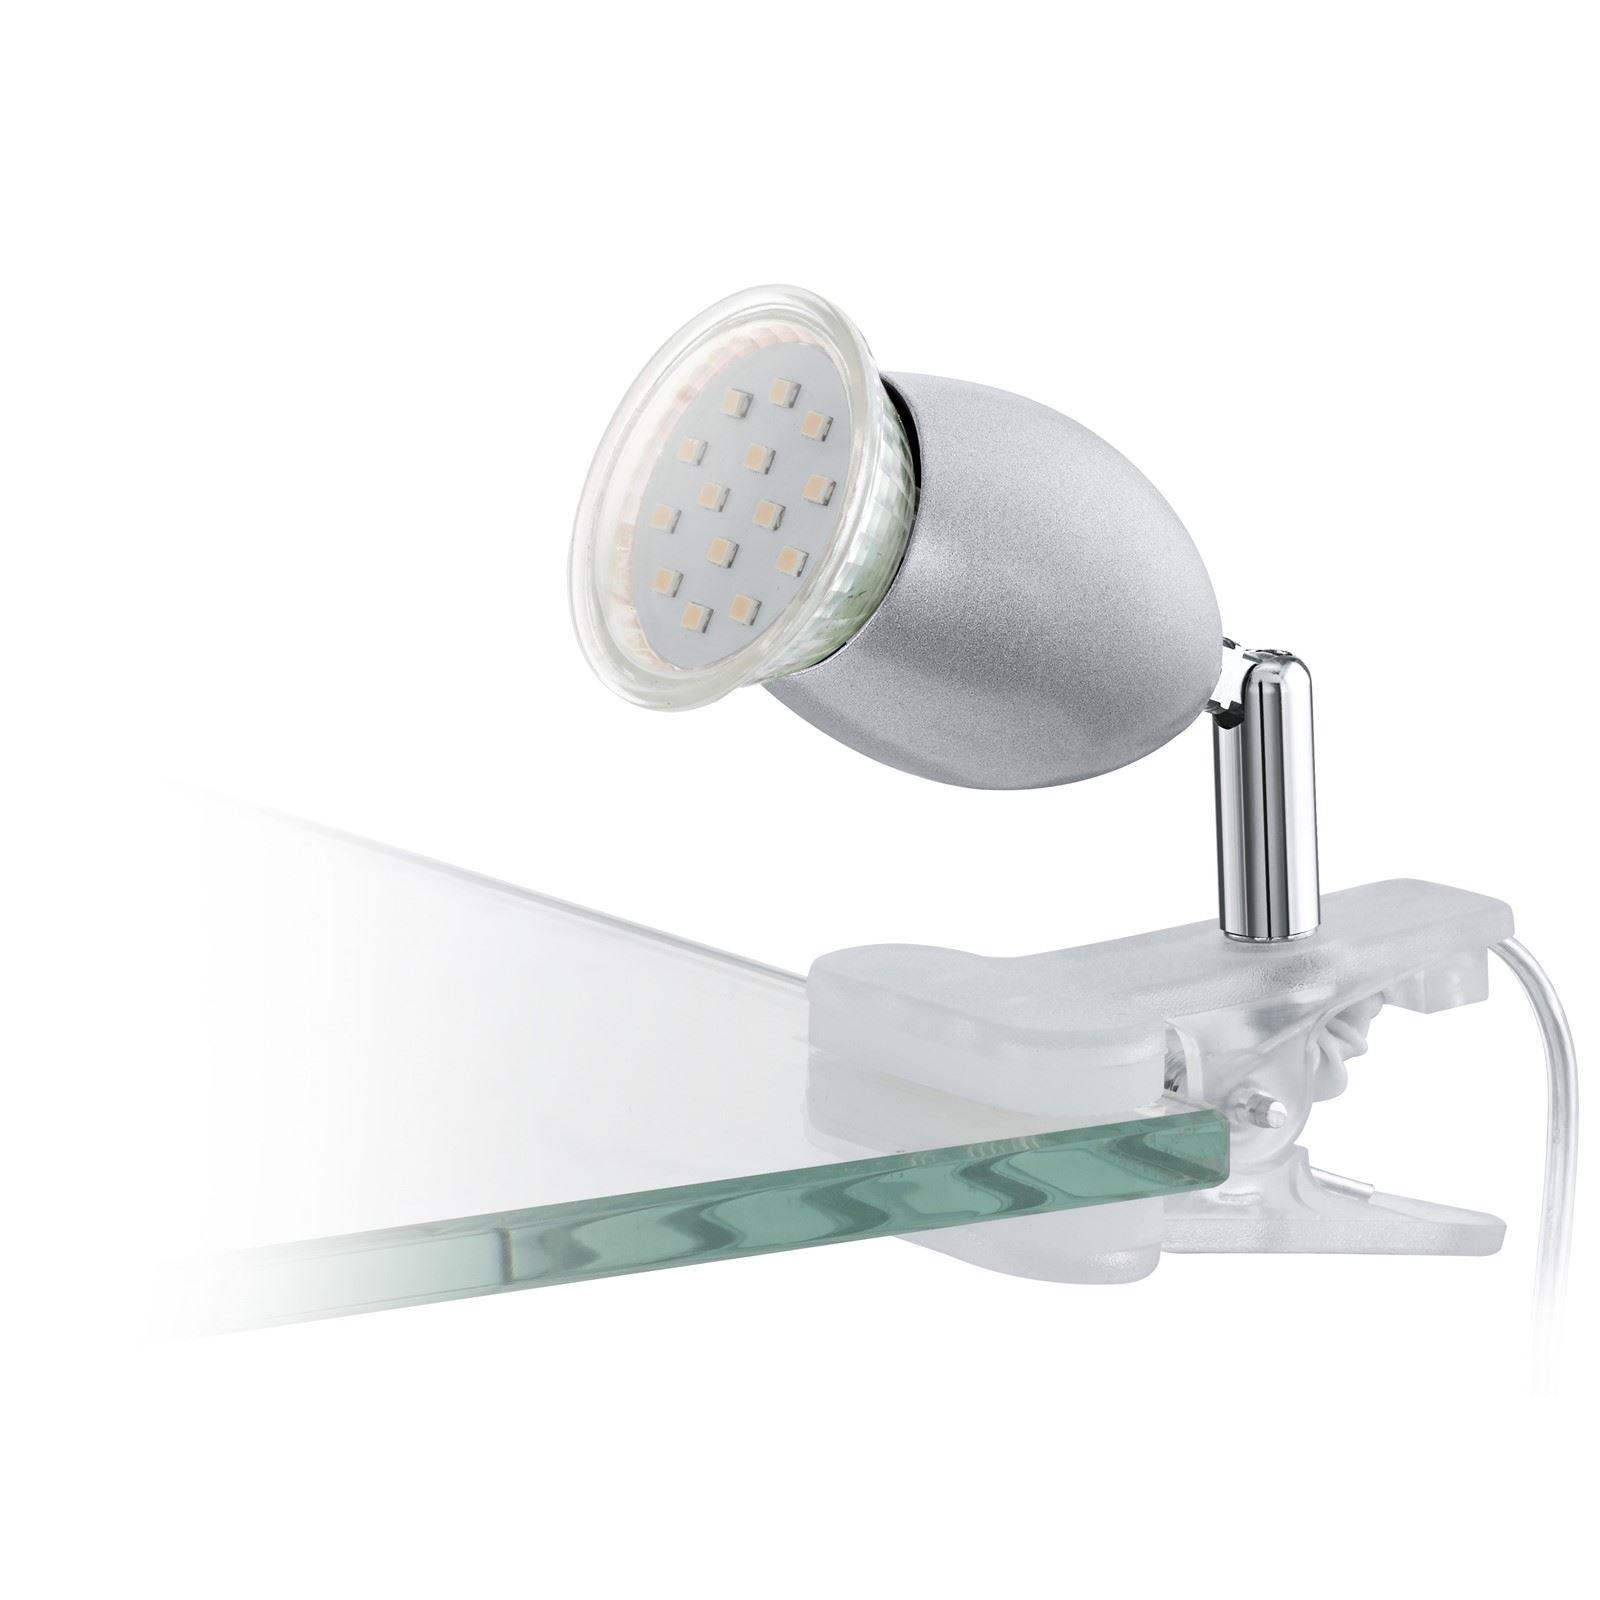 Banny Stylish Clip Lamp 1 Gu10 Light With Shiny Silver Finish